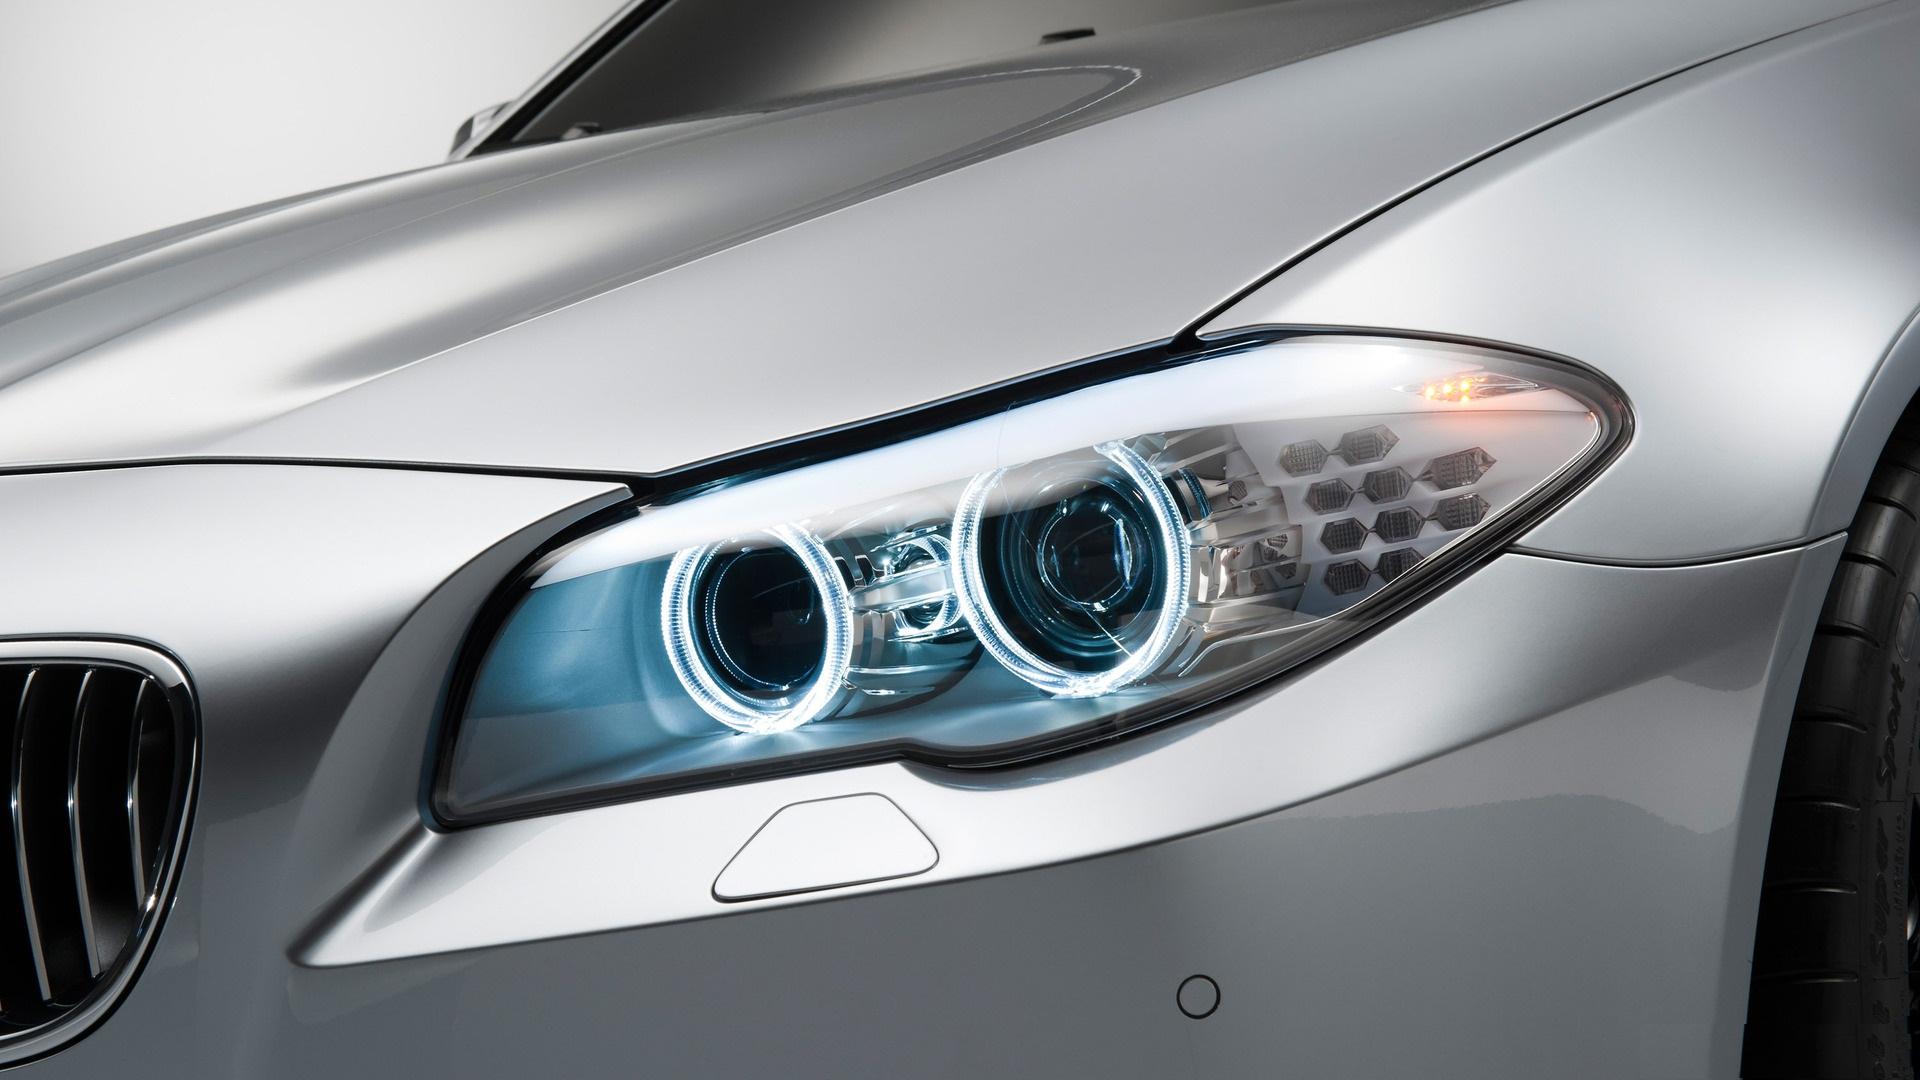 BMW m5 2012 Angel Eyes Wallpaper-1080p Free HD Resolutions ...